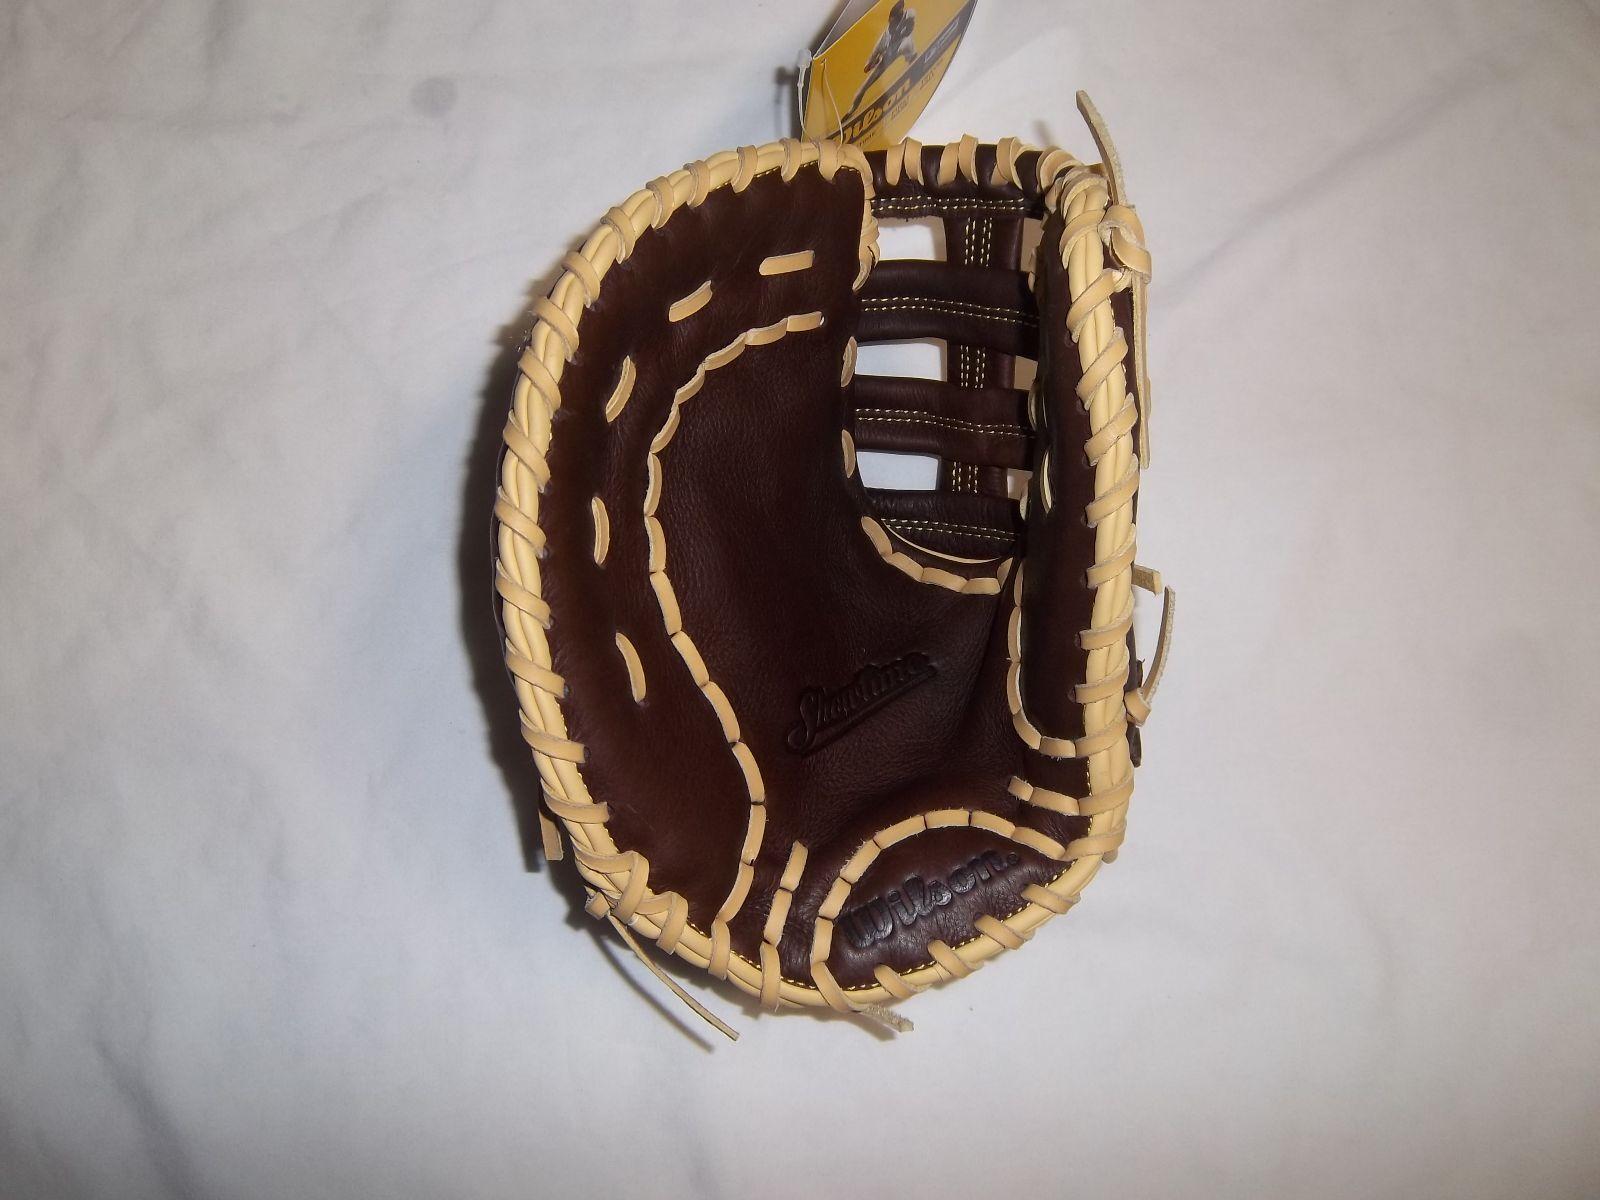 Guante De Béisbol Wilson base WTA08BLB16BM1ST reproductor de LH (va en la mano derecha)